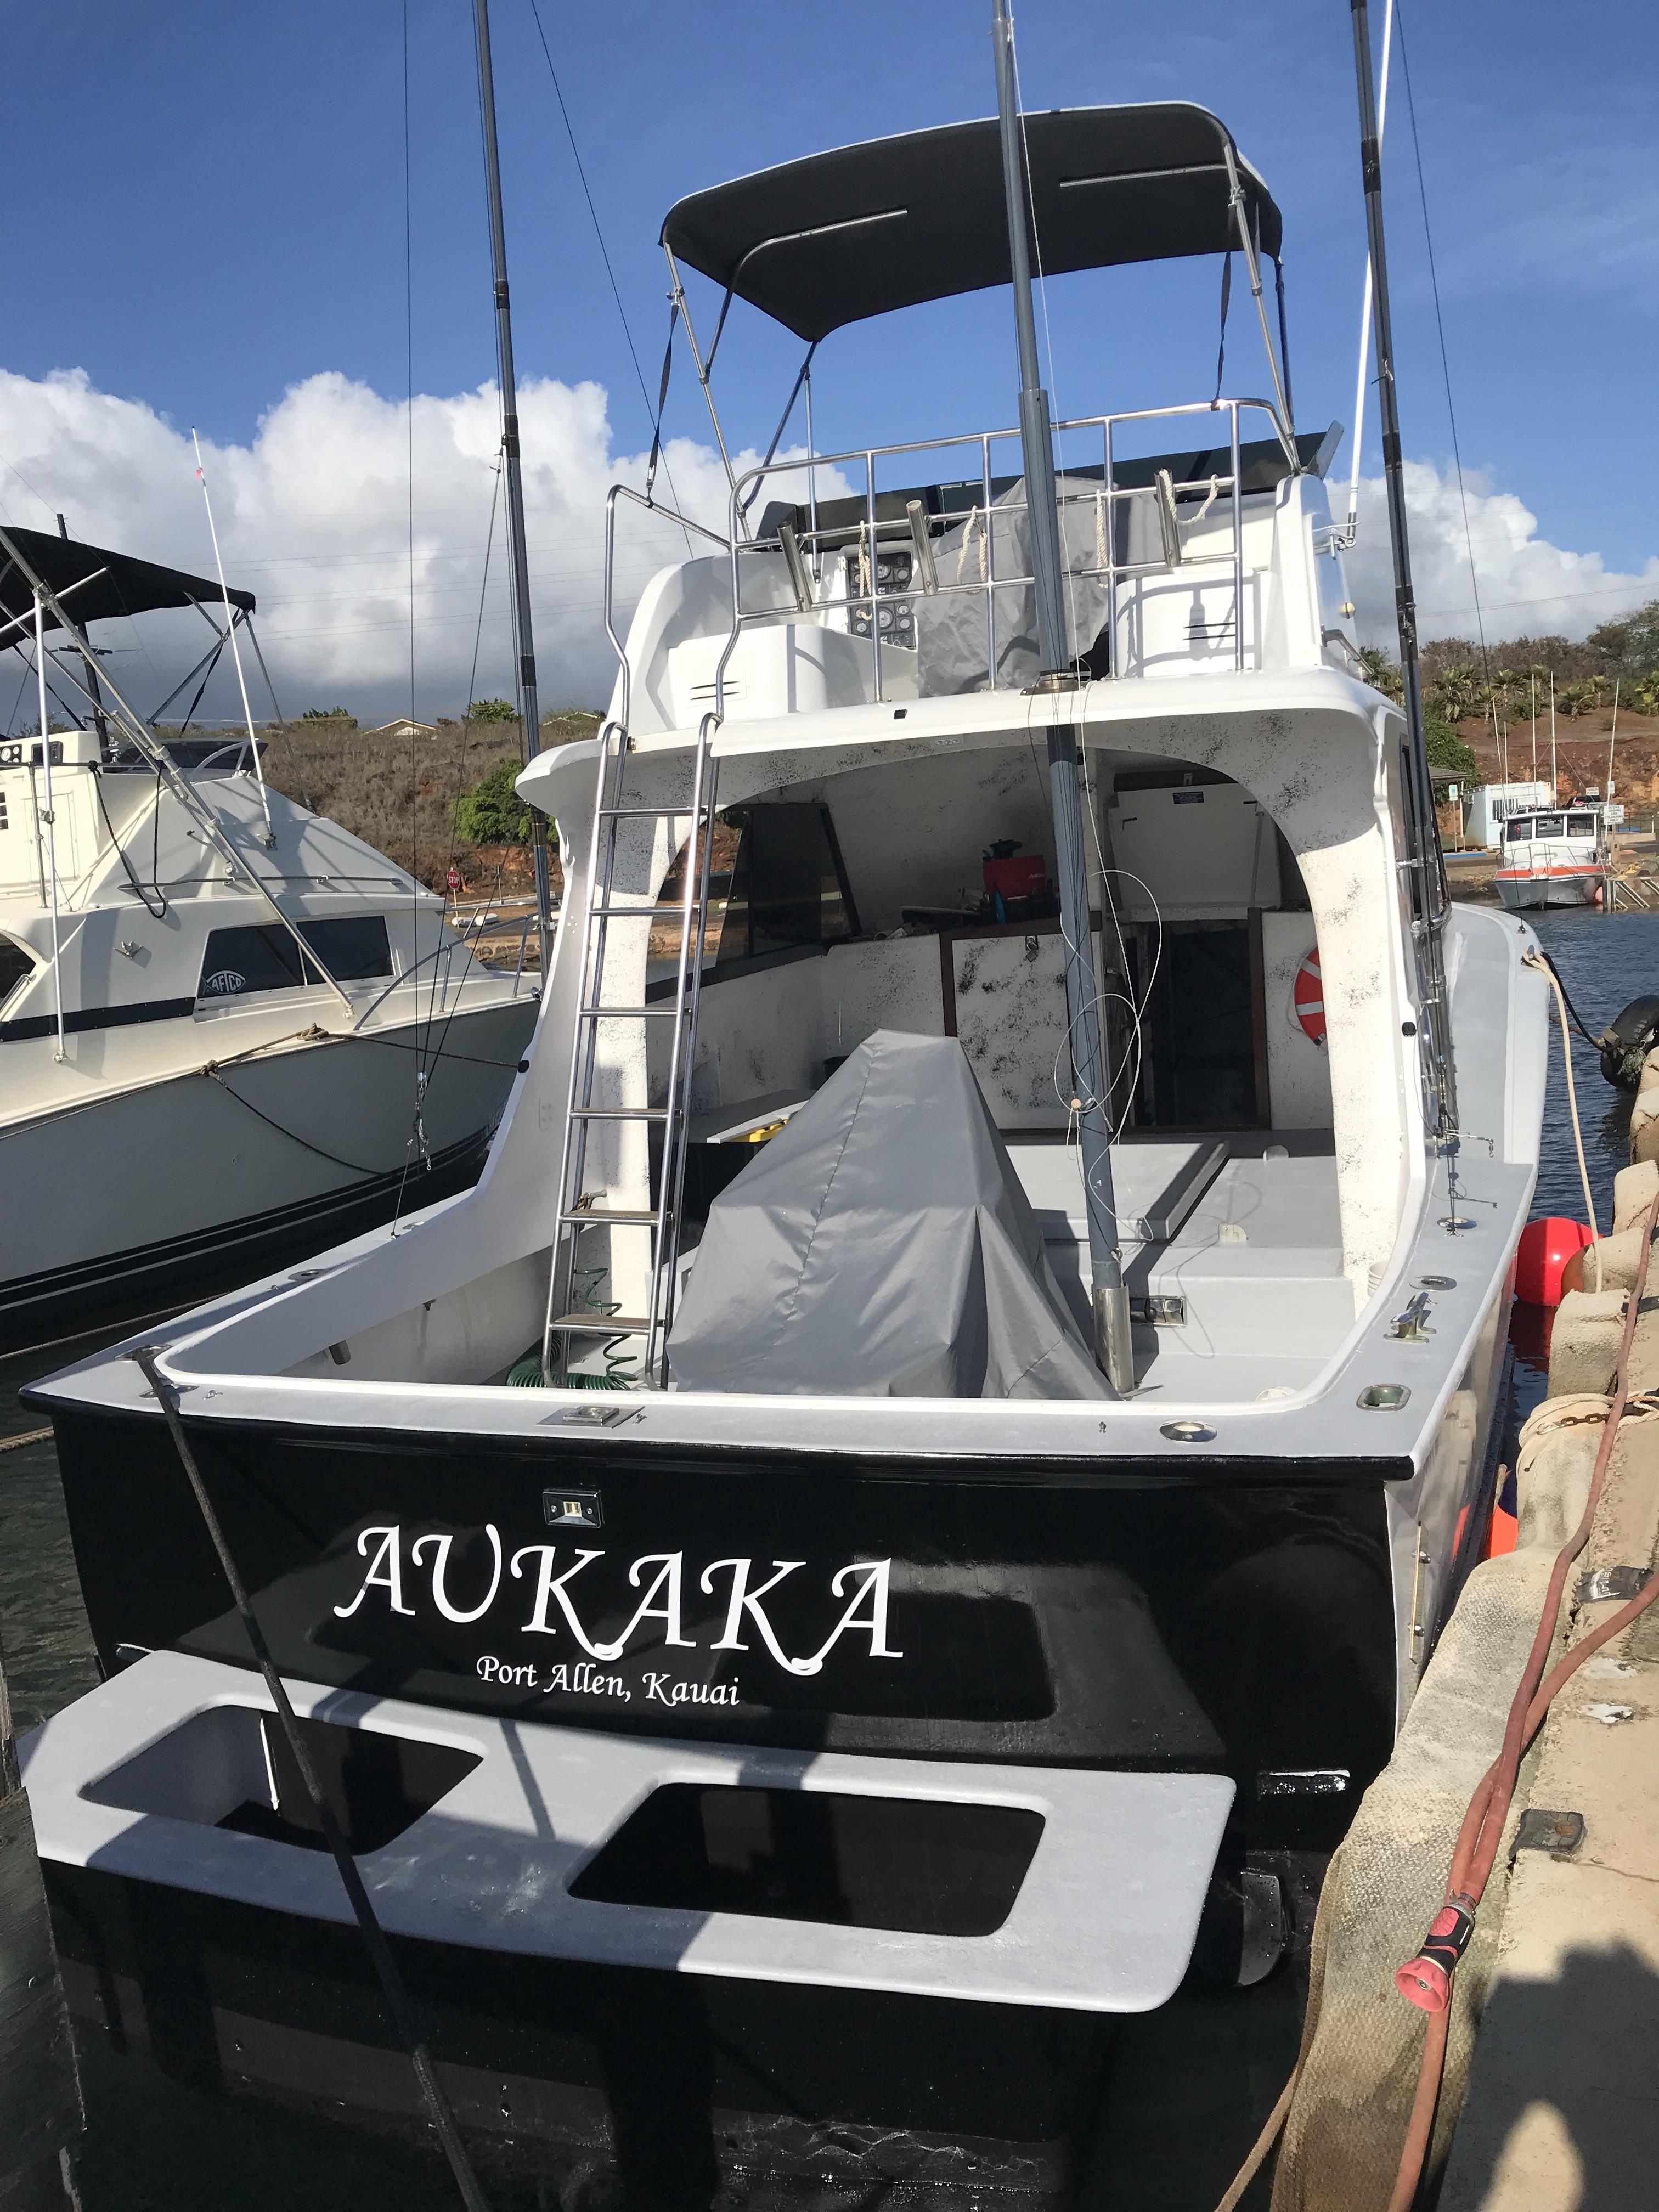 Kauai fishing charter aukaka fishing in kauai hawaii for Fishing in kauai